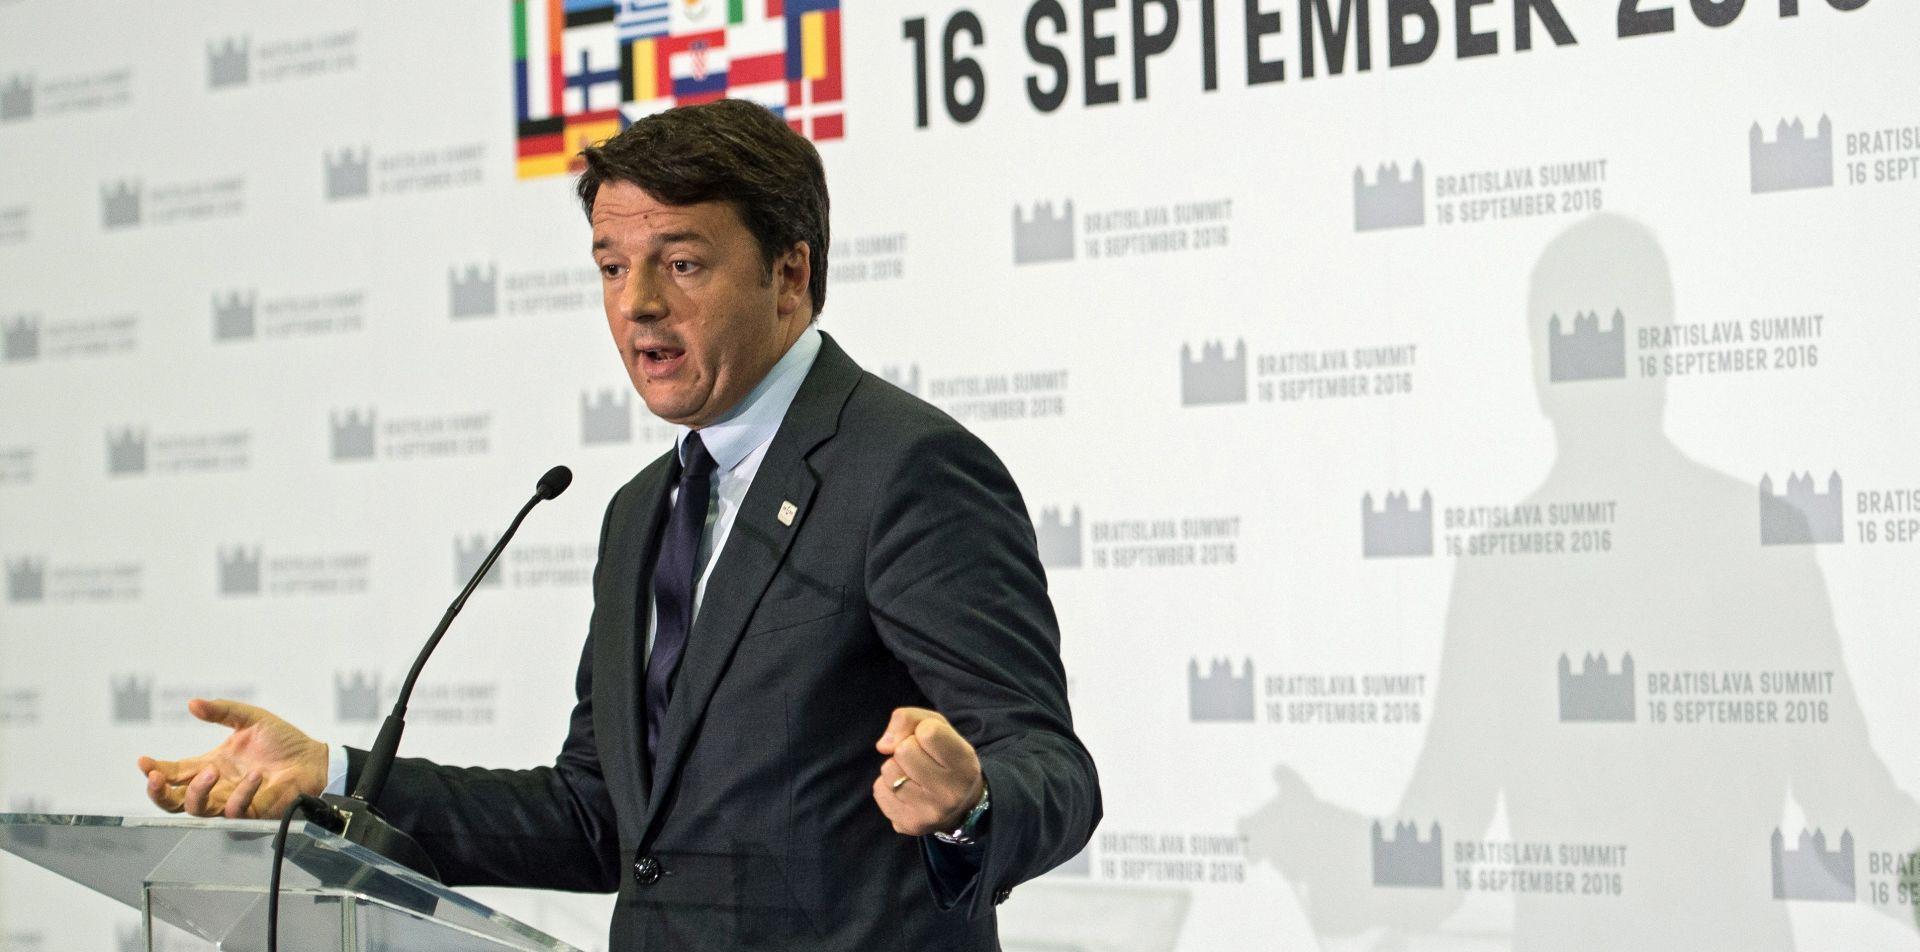 Renziju dosta besmislenih summita EU-a, traži stvarnu akciju